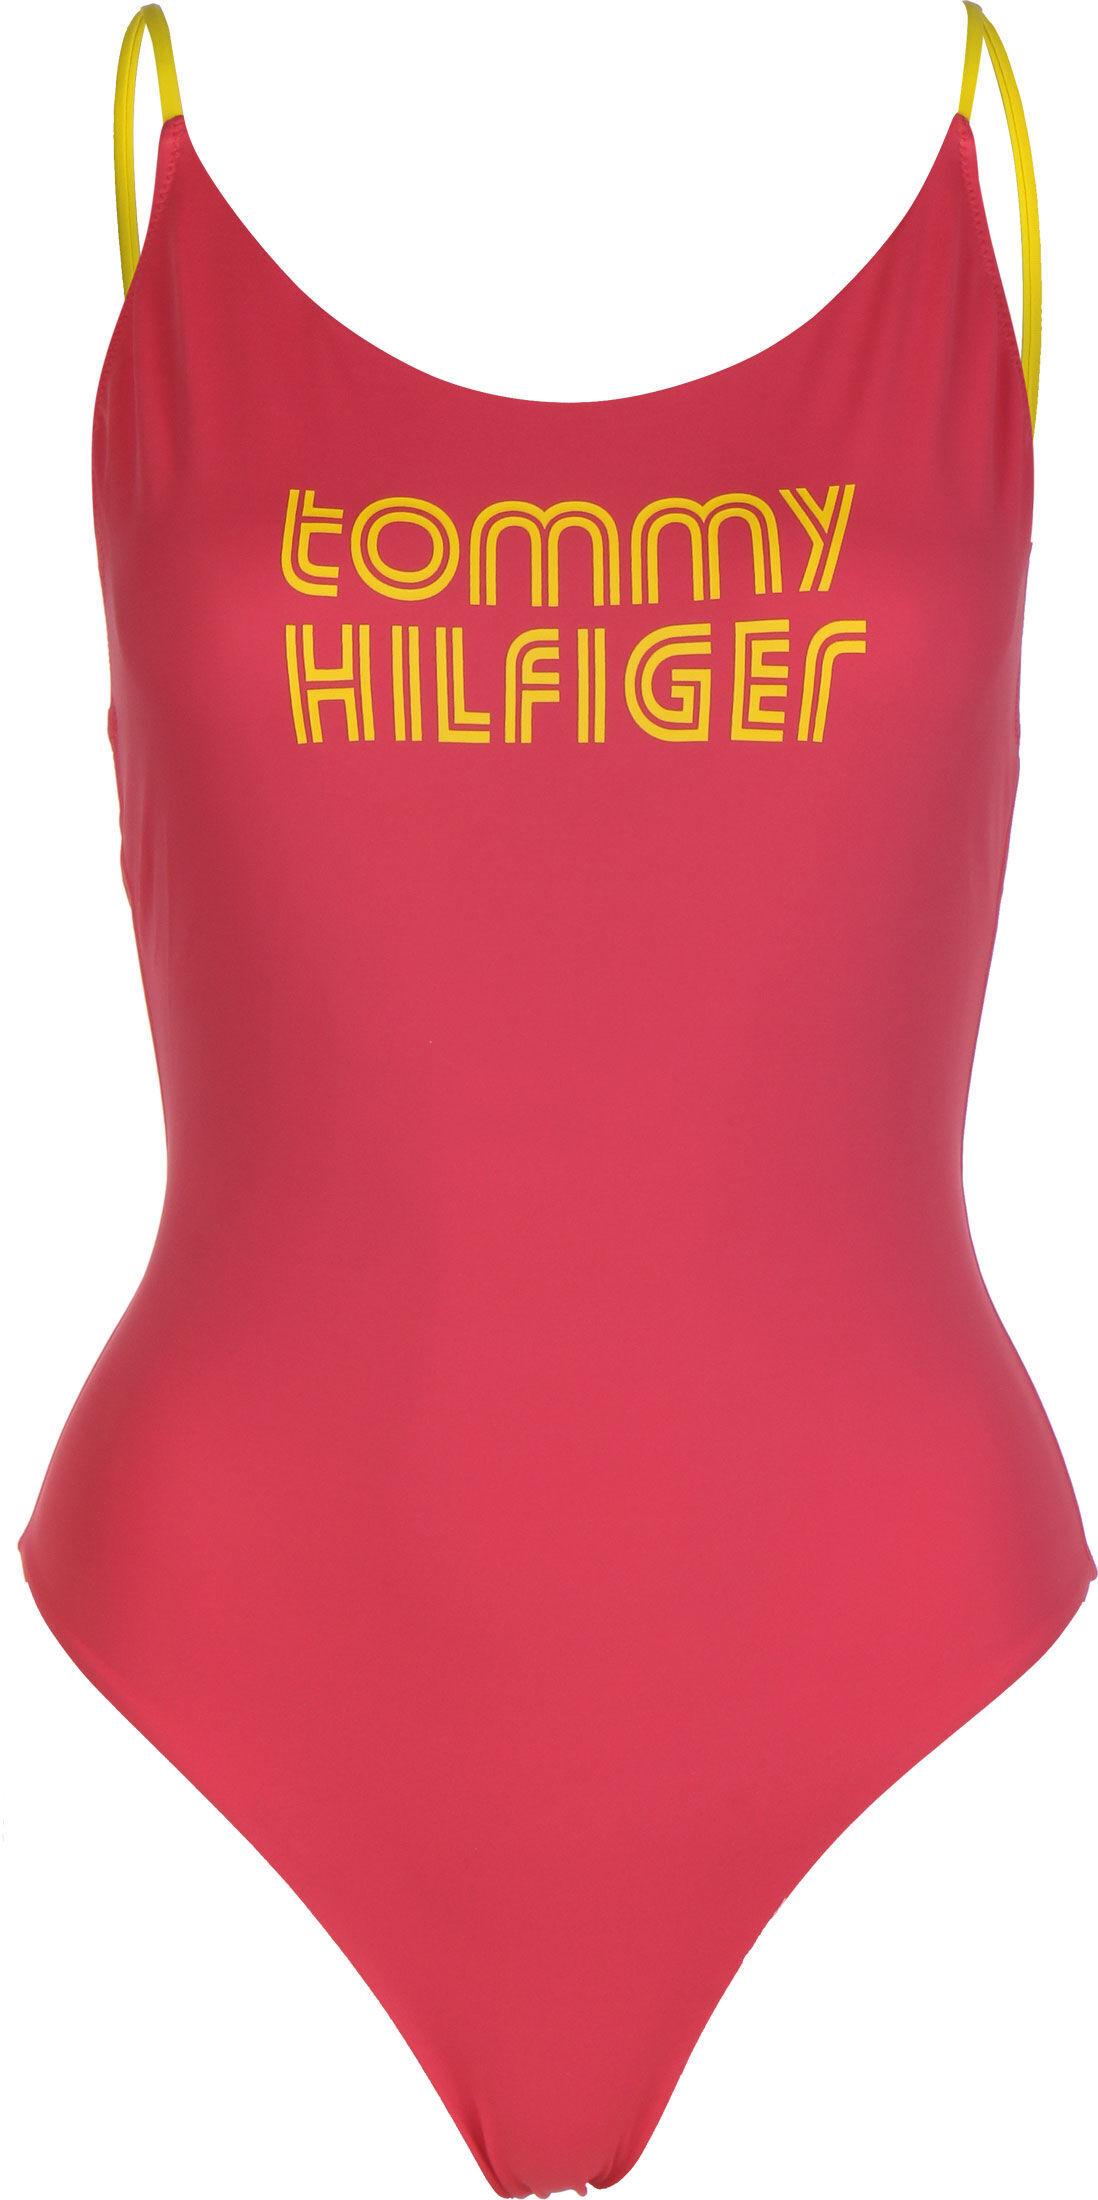 Tommy Hilfiger maillot de bain, S, femme rose